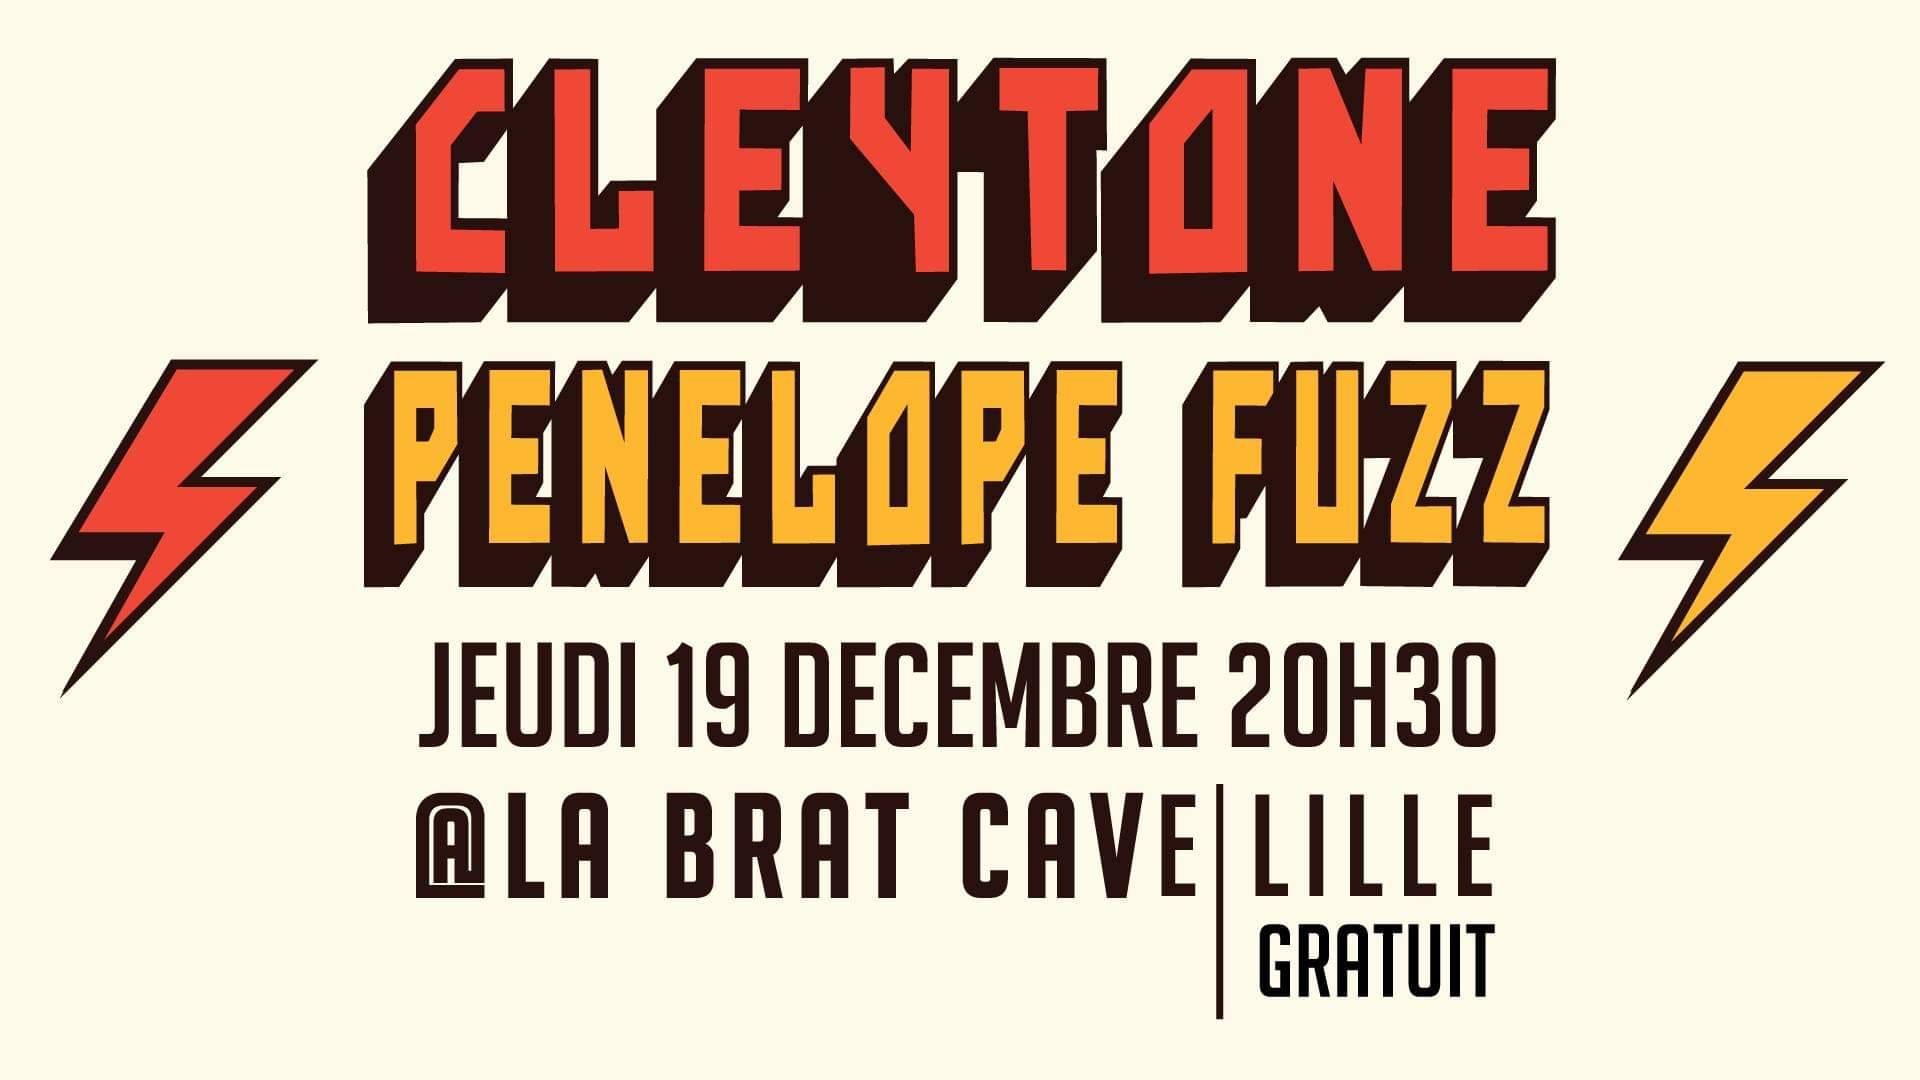 Cleytone + Penelope Fuzz à la Brat Cave